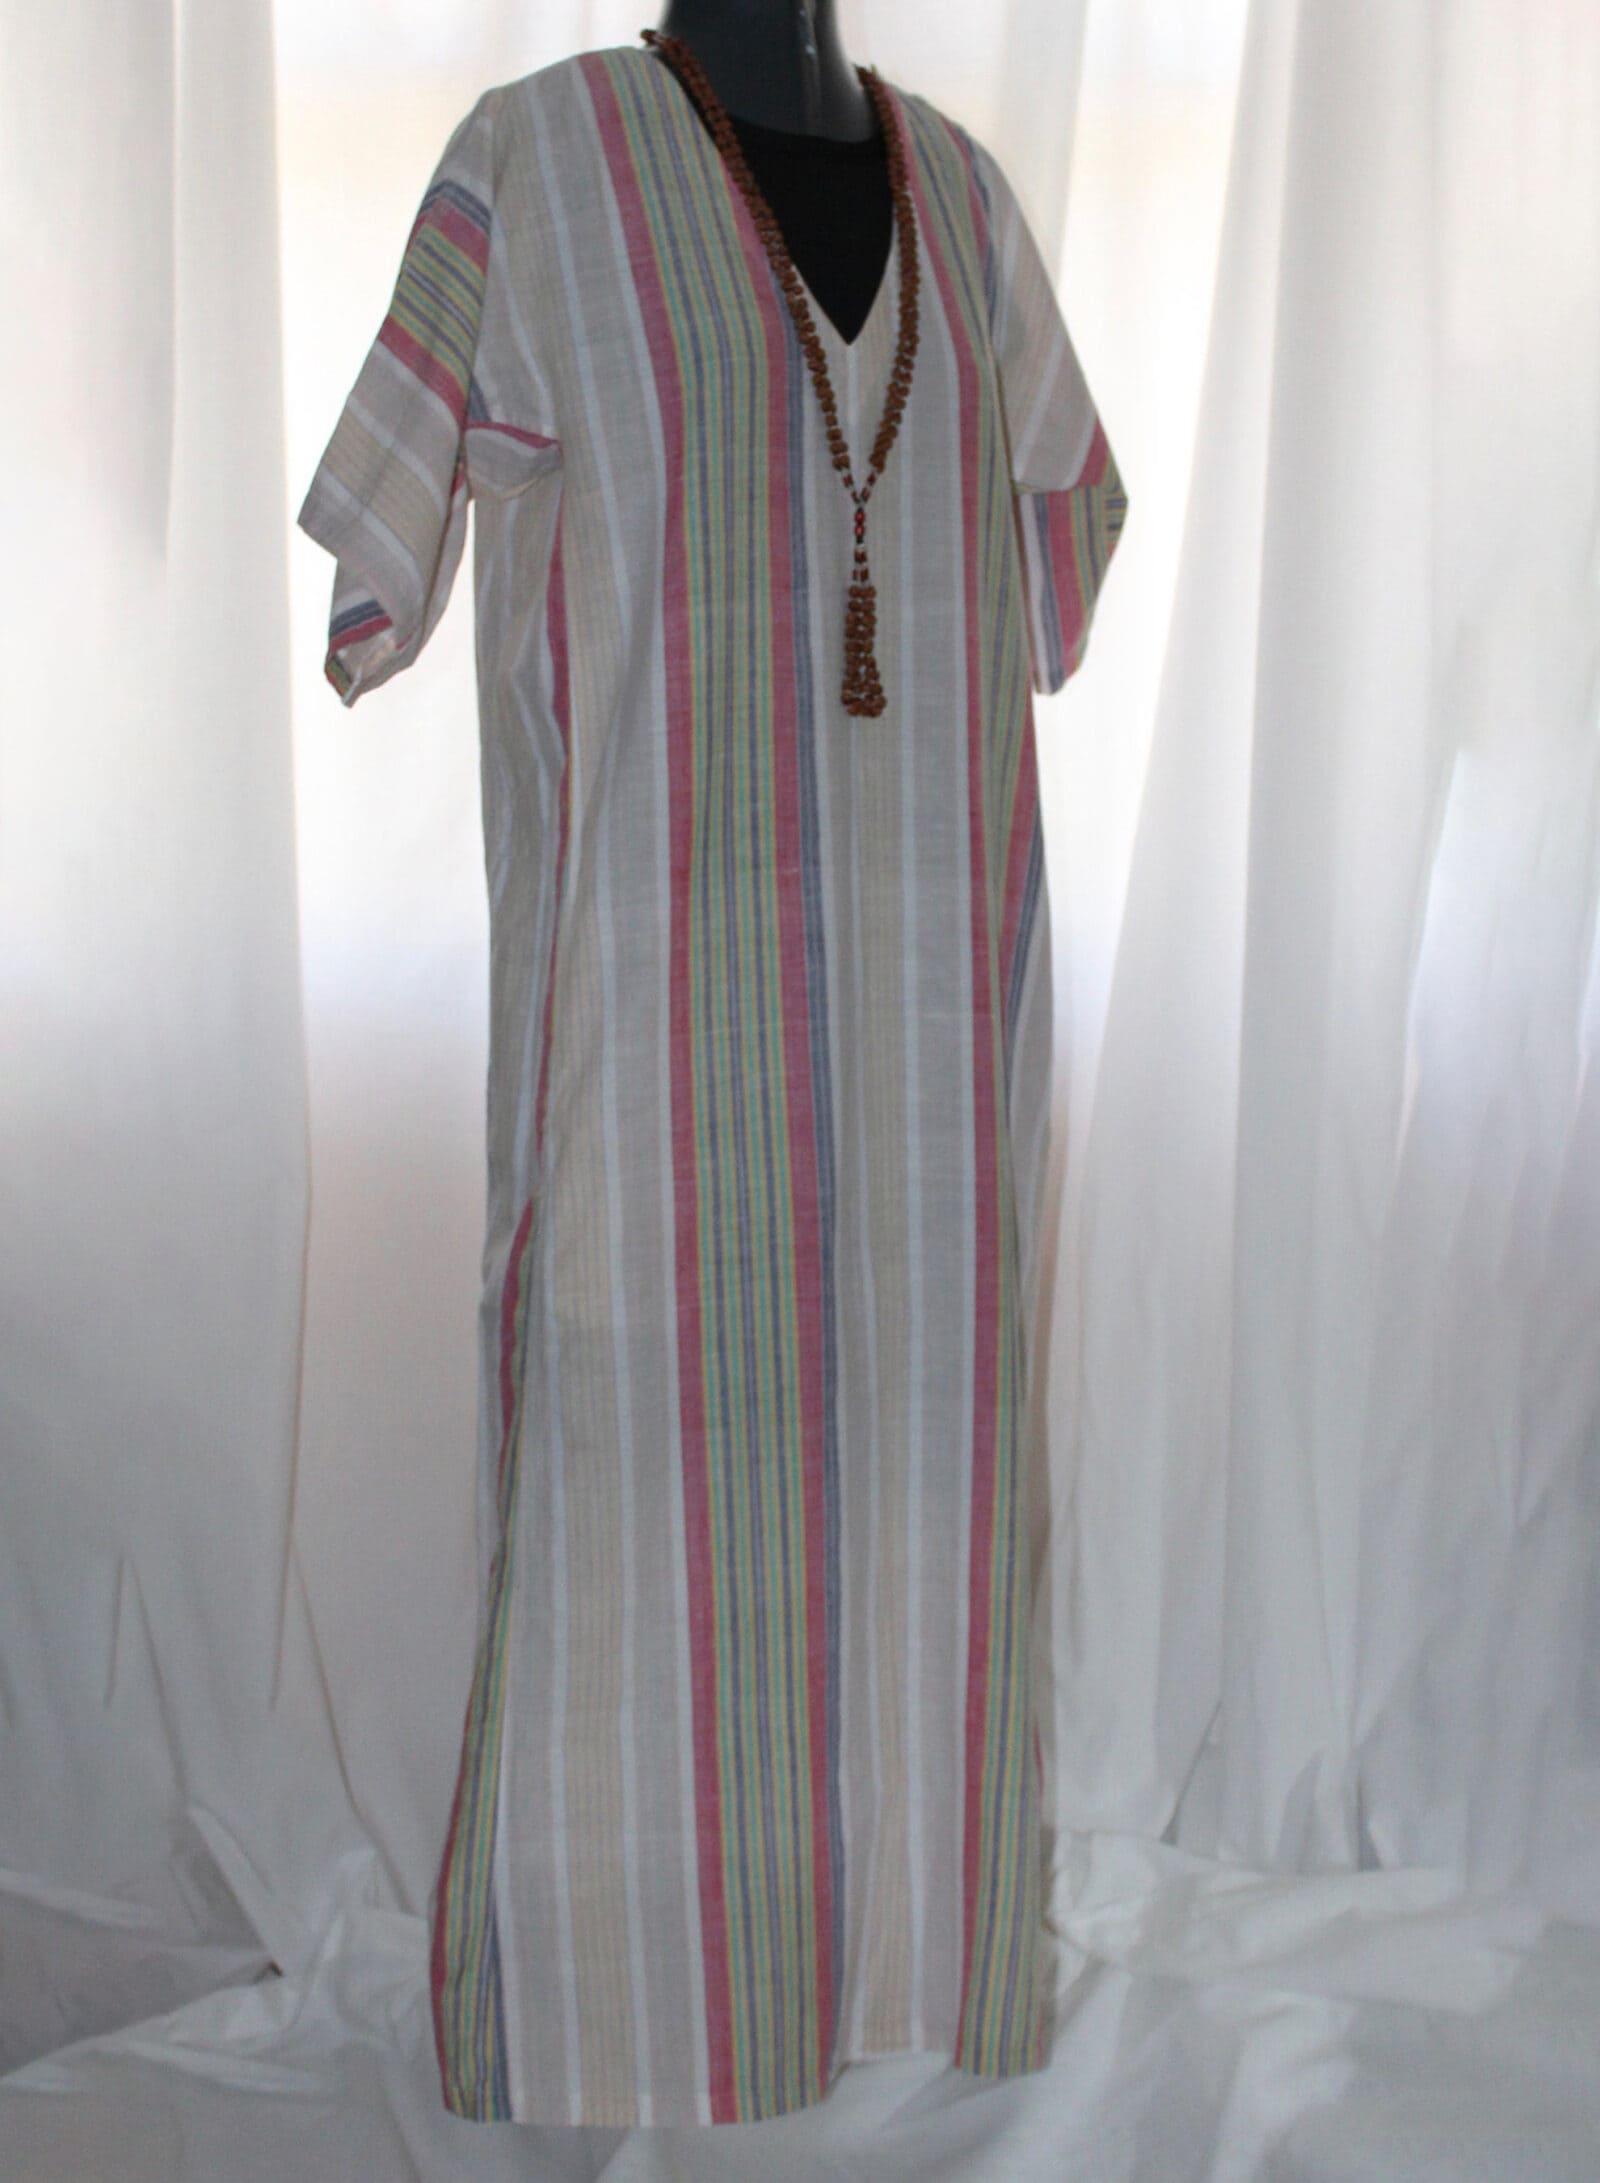 Vintage 70s Calvin Klein kaftan desert color stripes v neck short sleeve light semi sheer cotton vintage summer caftan dress designer